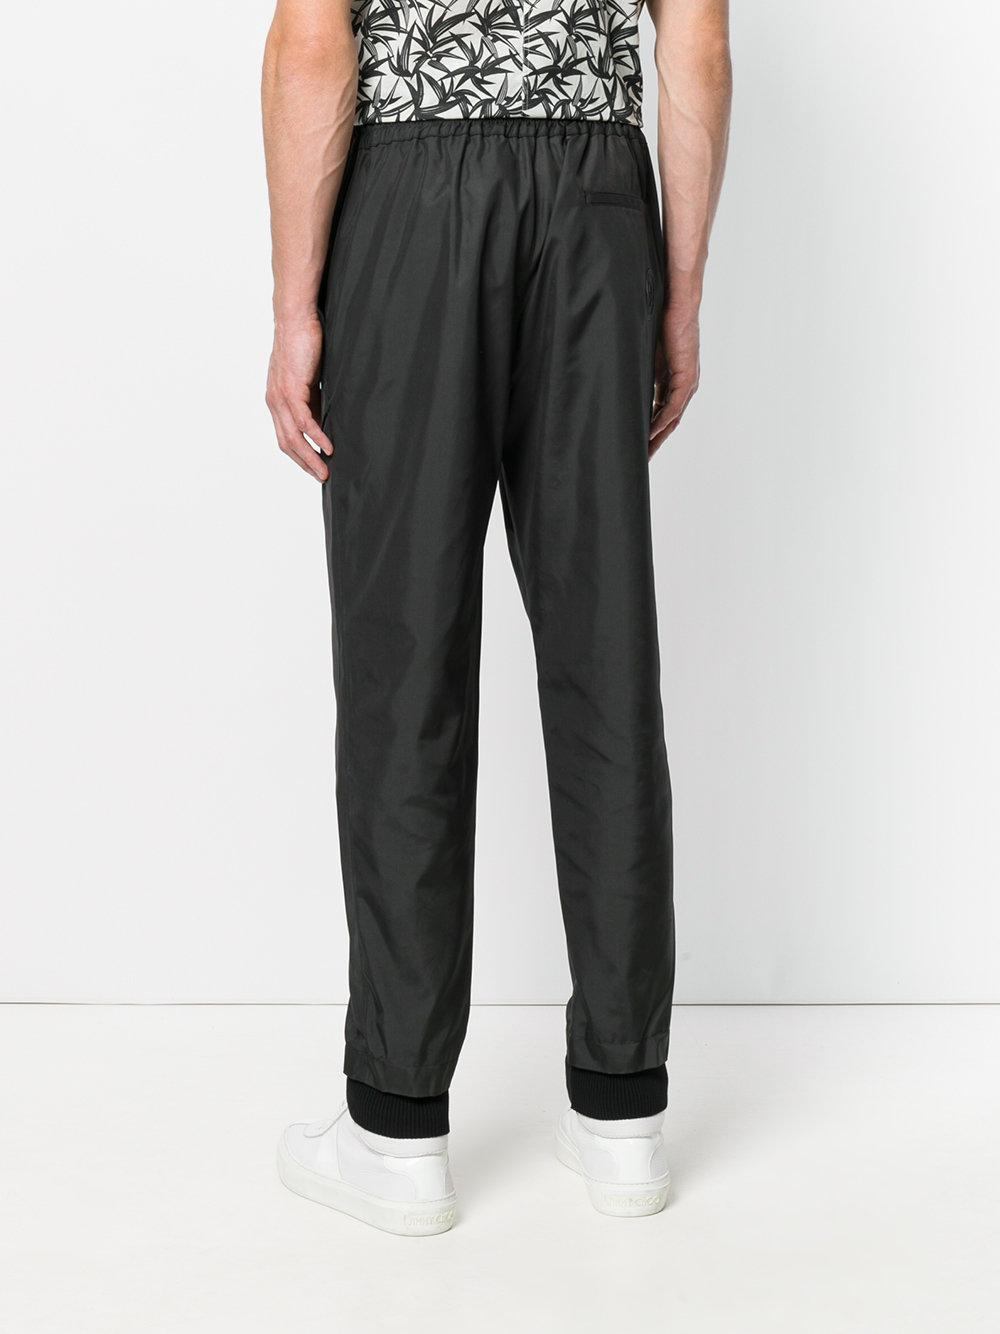 Versus Cotton Classic Track Pants in Black for Men